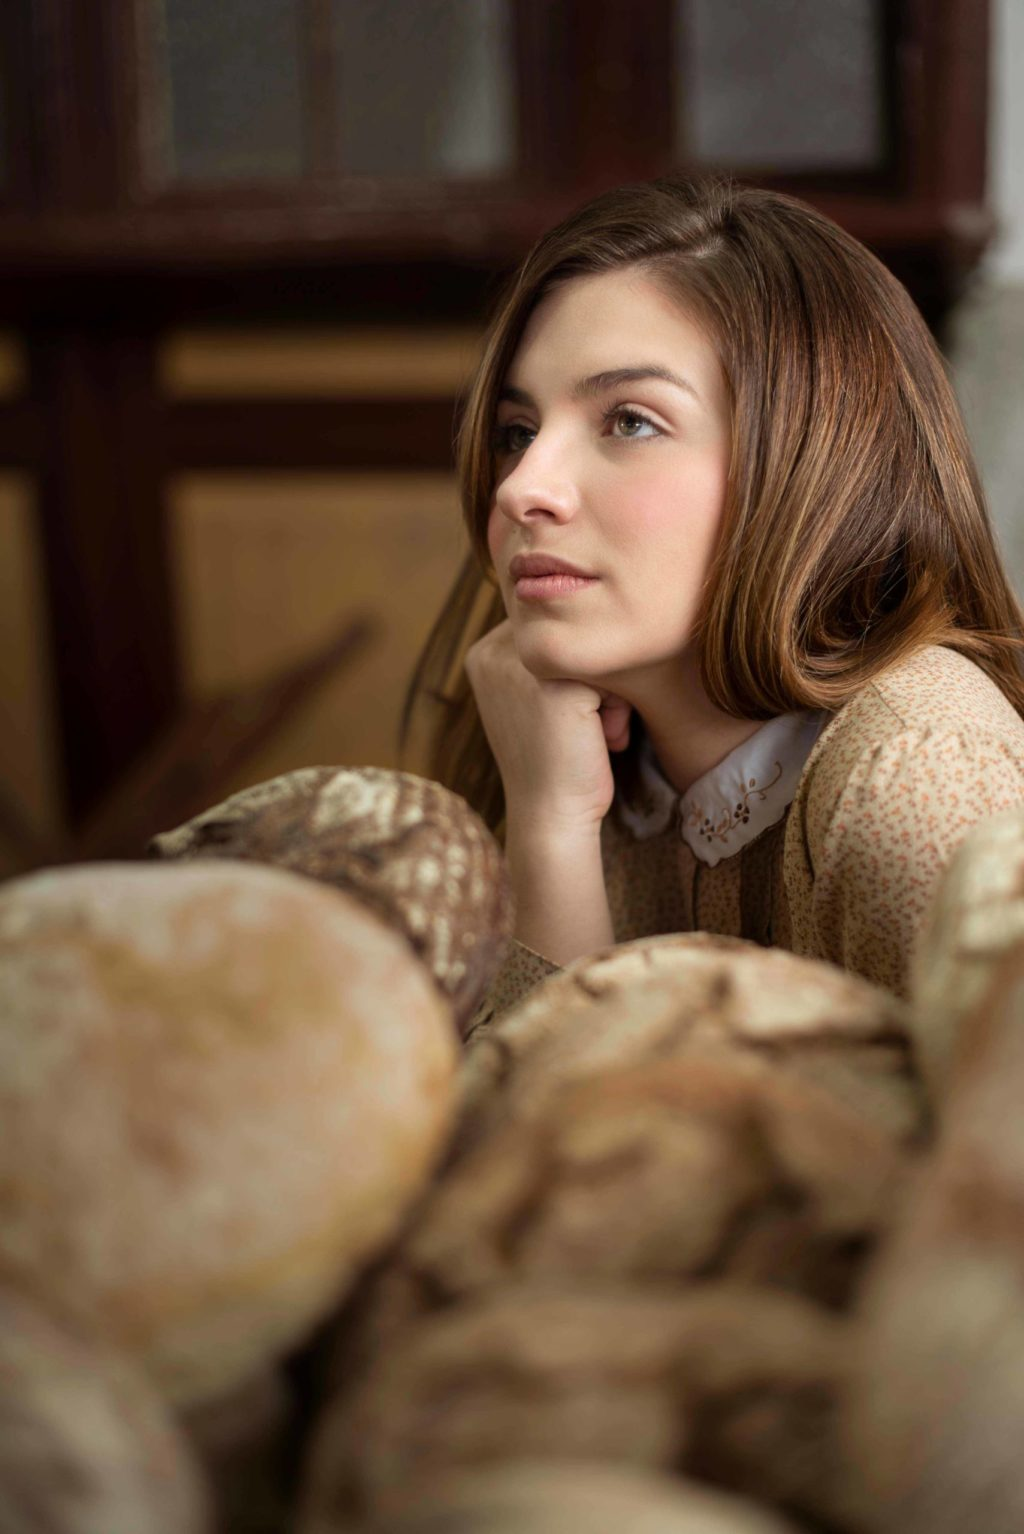 bread, joven, shooting, portrait, model